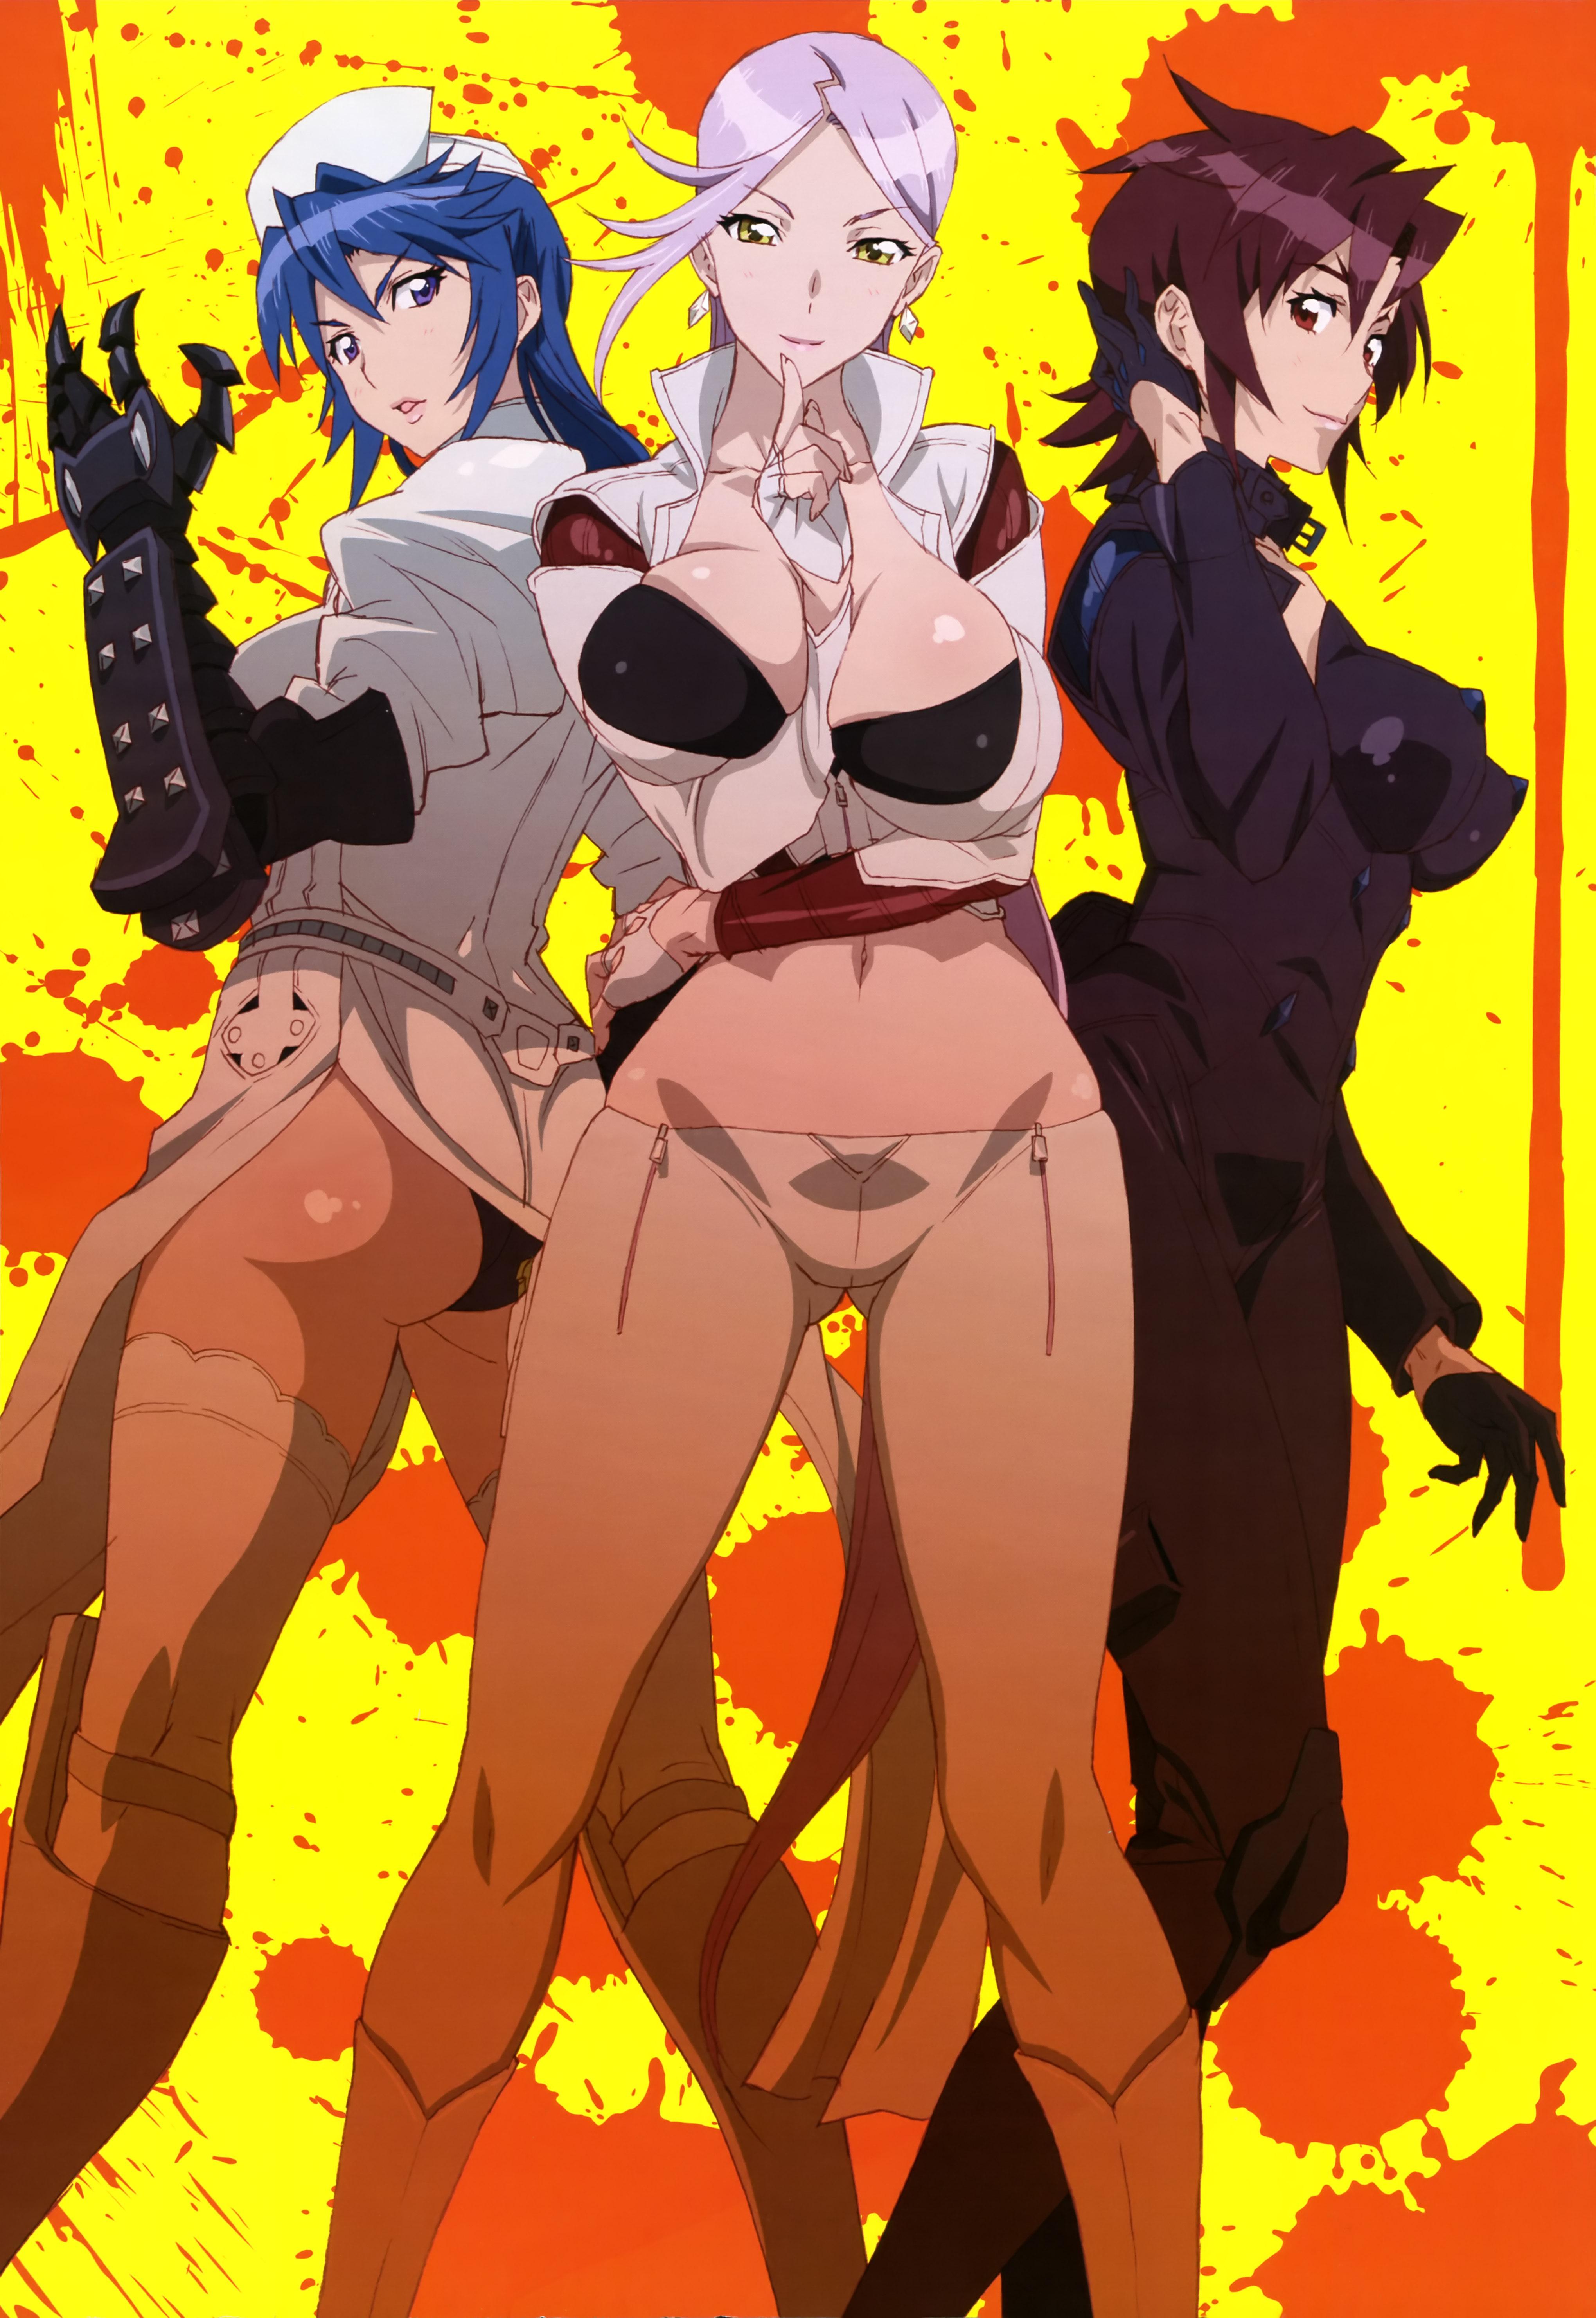 NyanType Magazine April 2015 anime posters Haruhichan.com Triage X